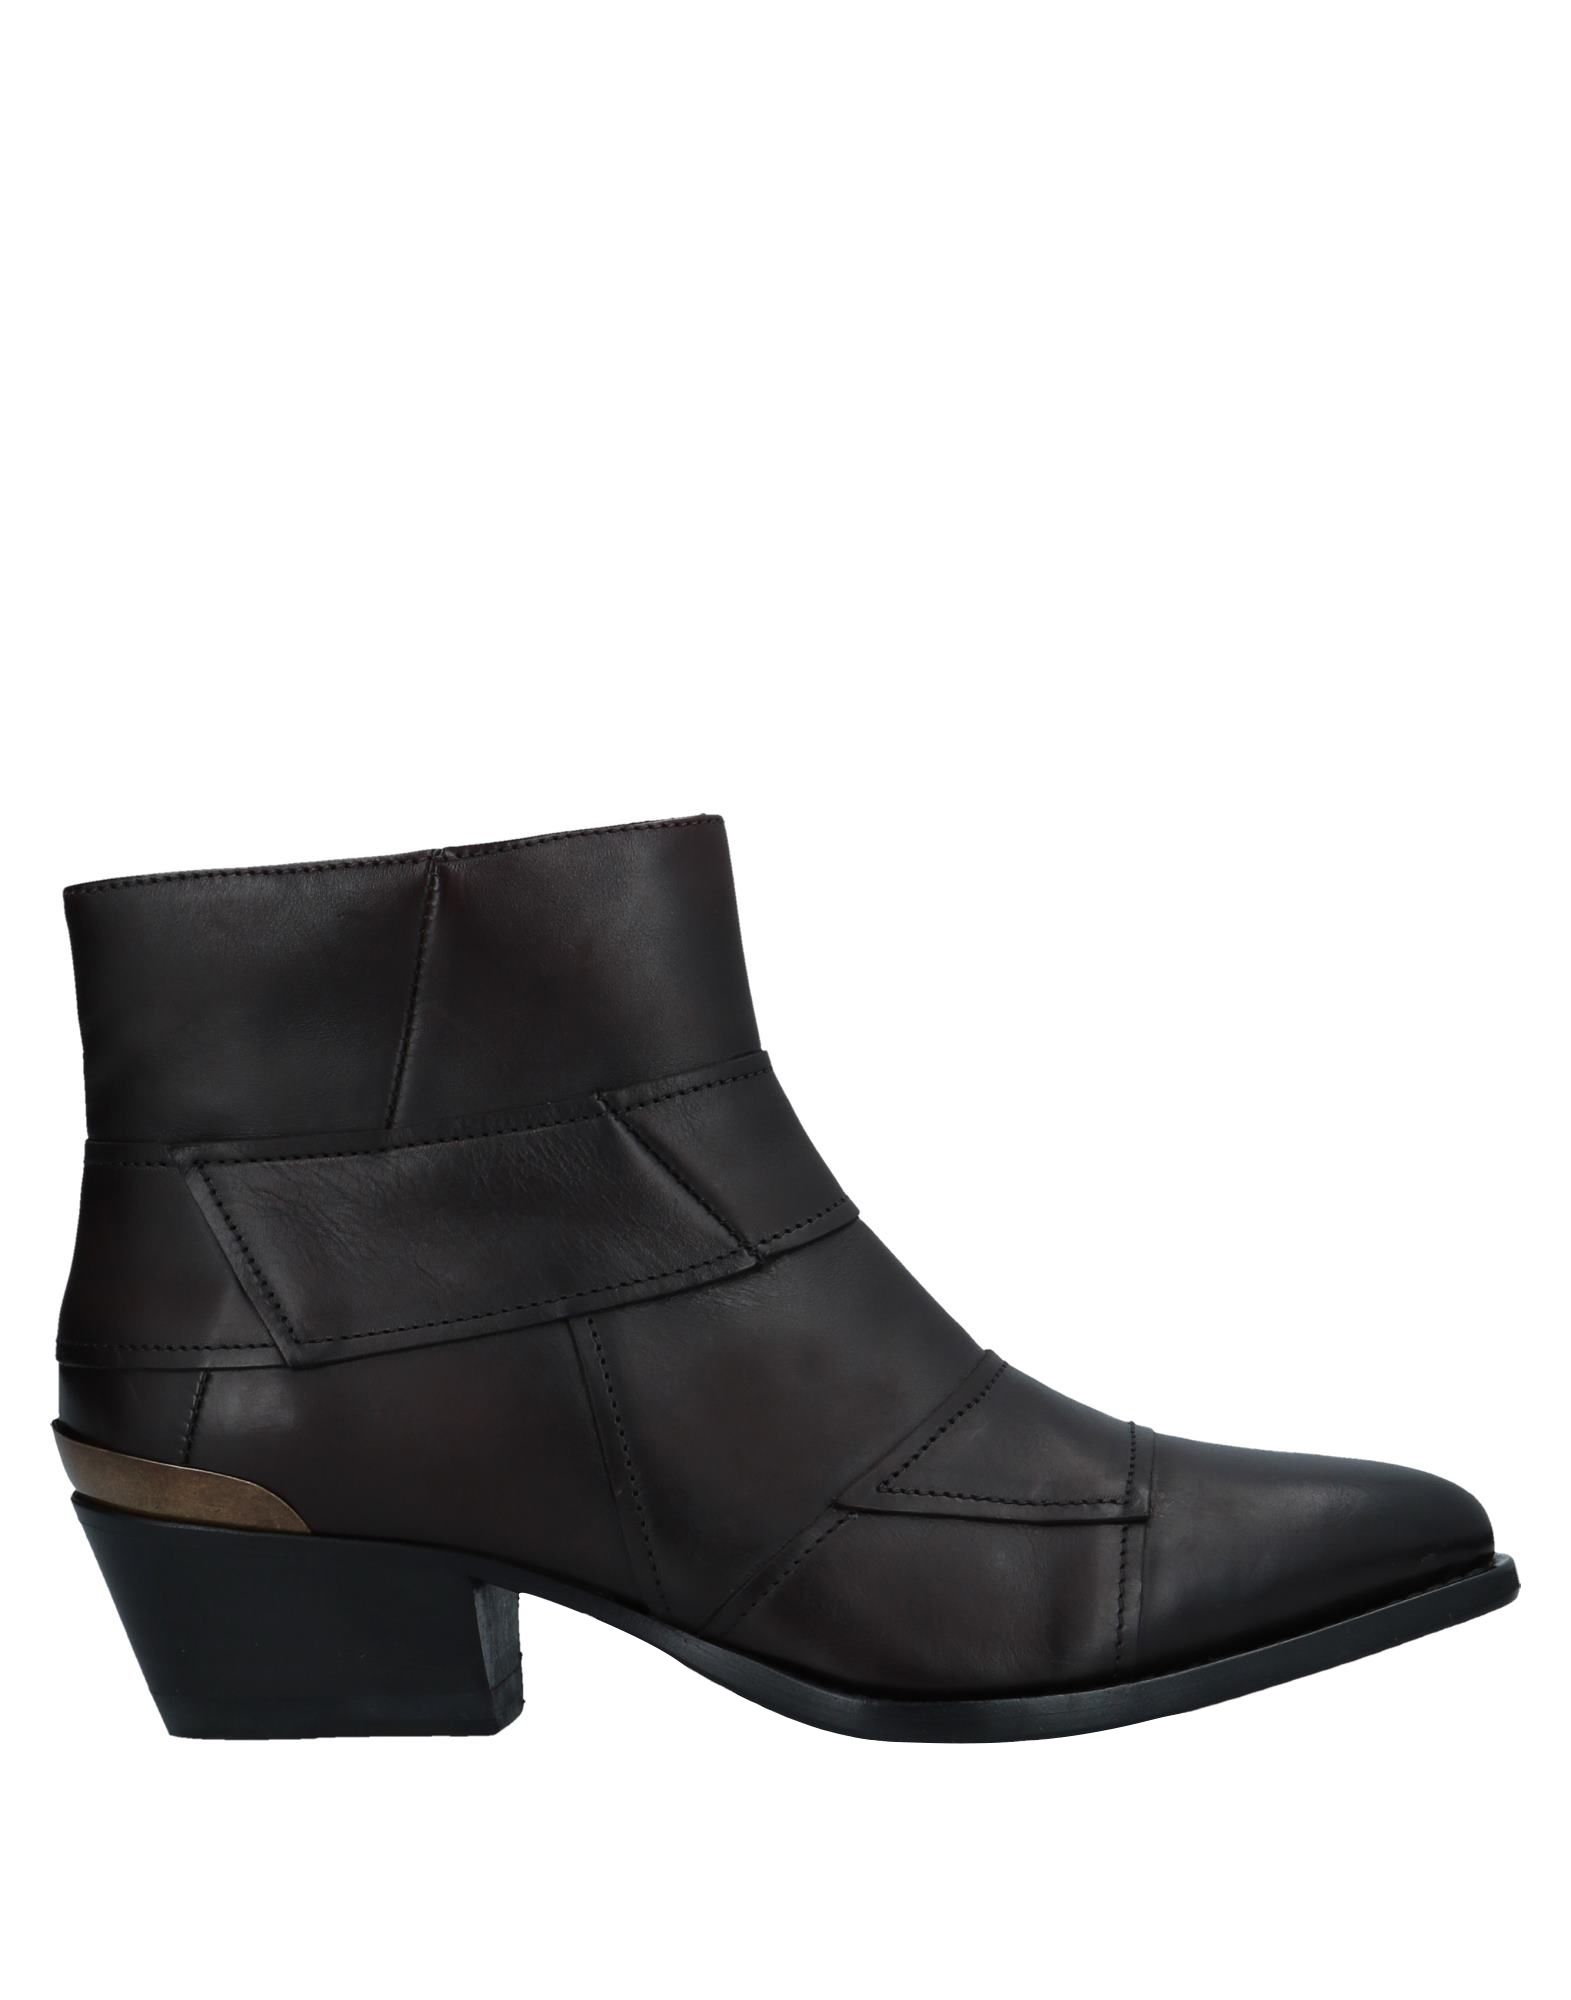 Buttero® Stiefelette Damen  11548028FTGut Schuhe aussehende strapazierfähige Schuhe 11548028FTGut fc5823